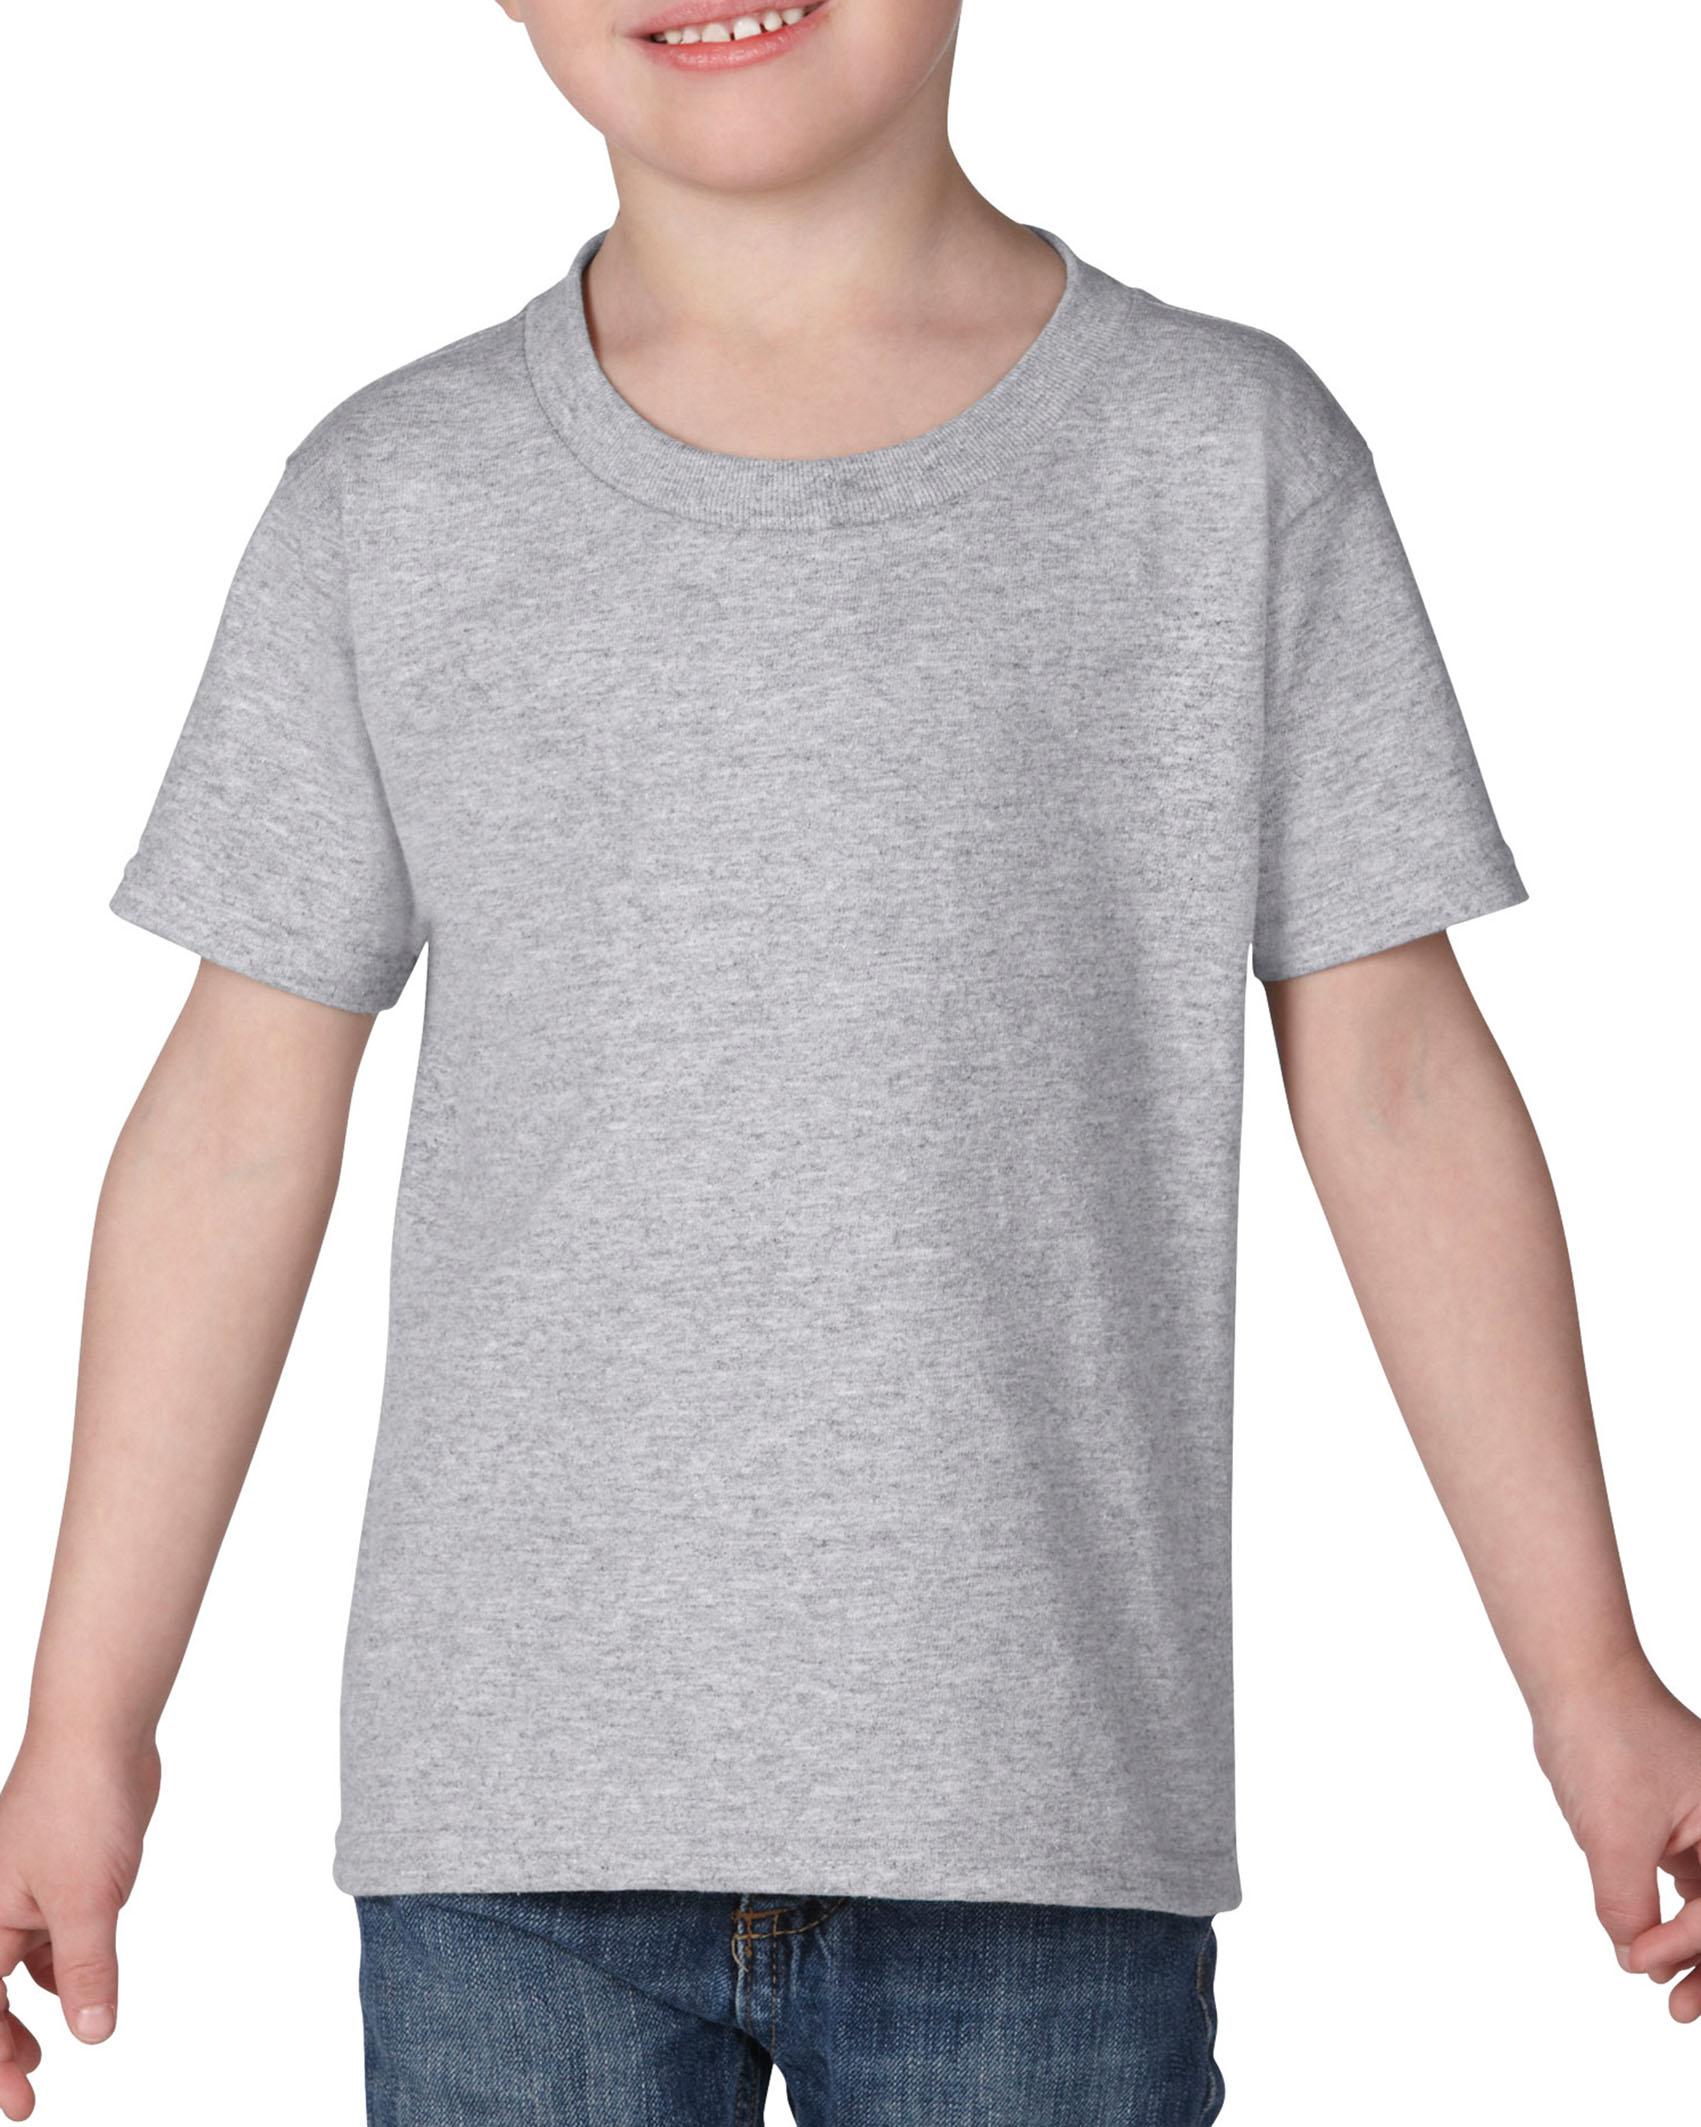 Gildan T-shirt Heavy Cotton SS for Toddler